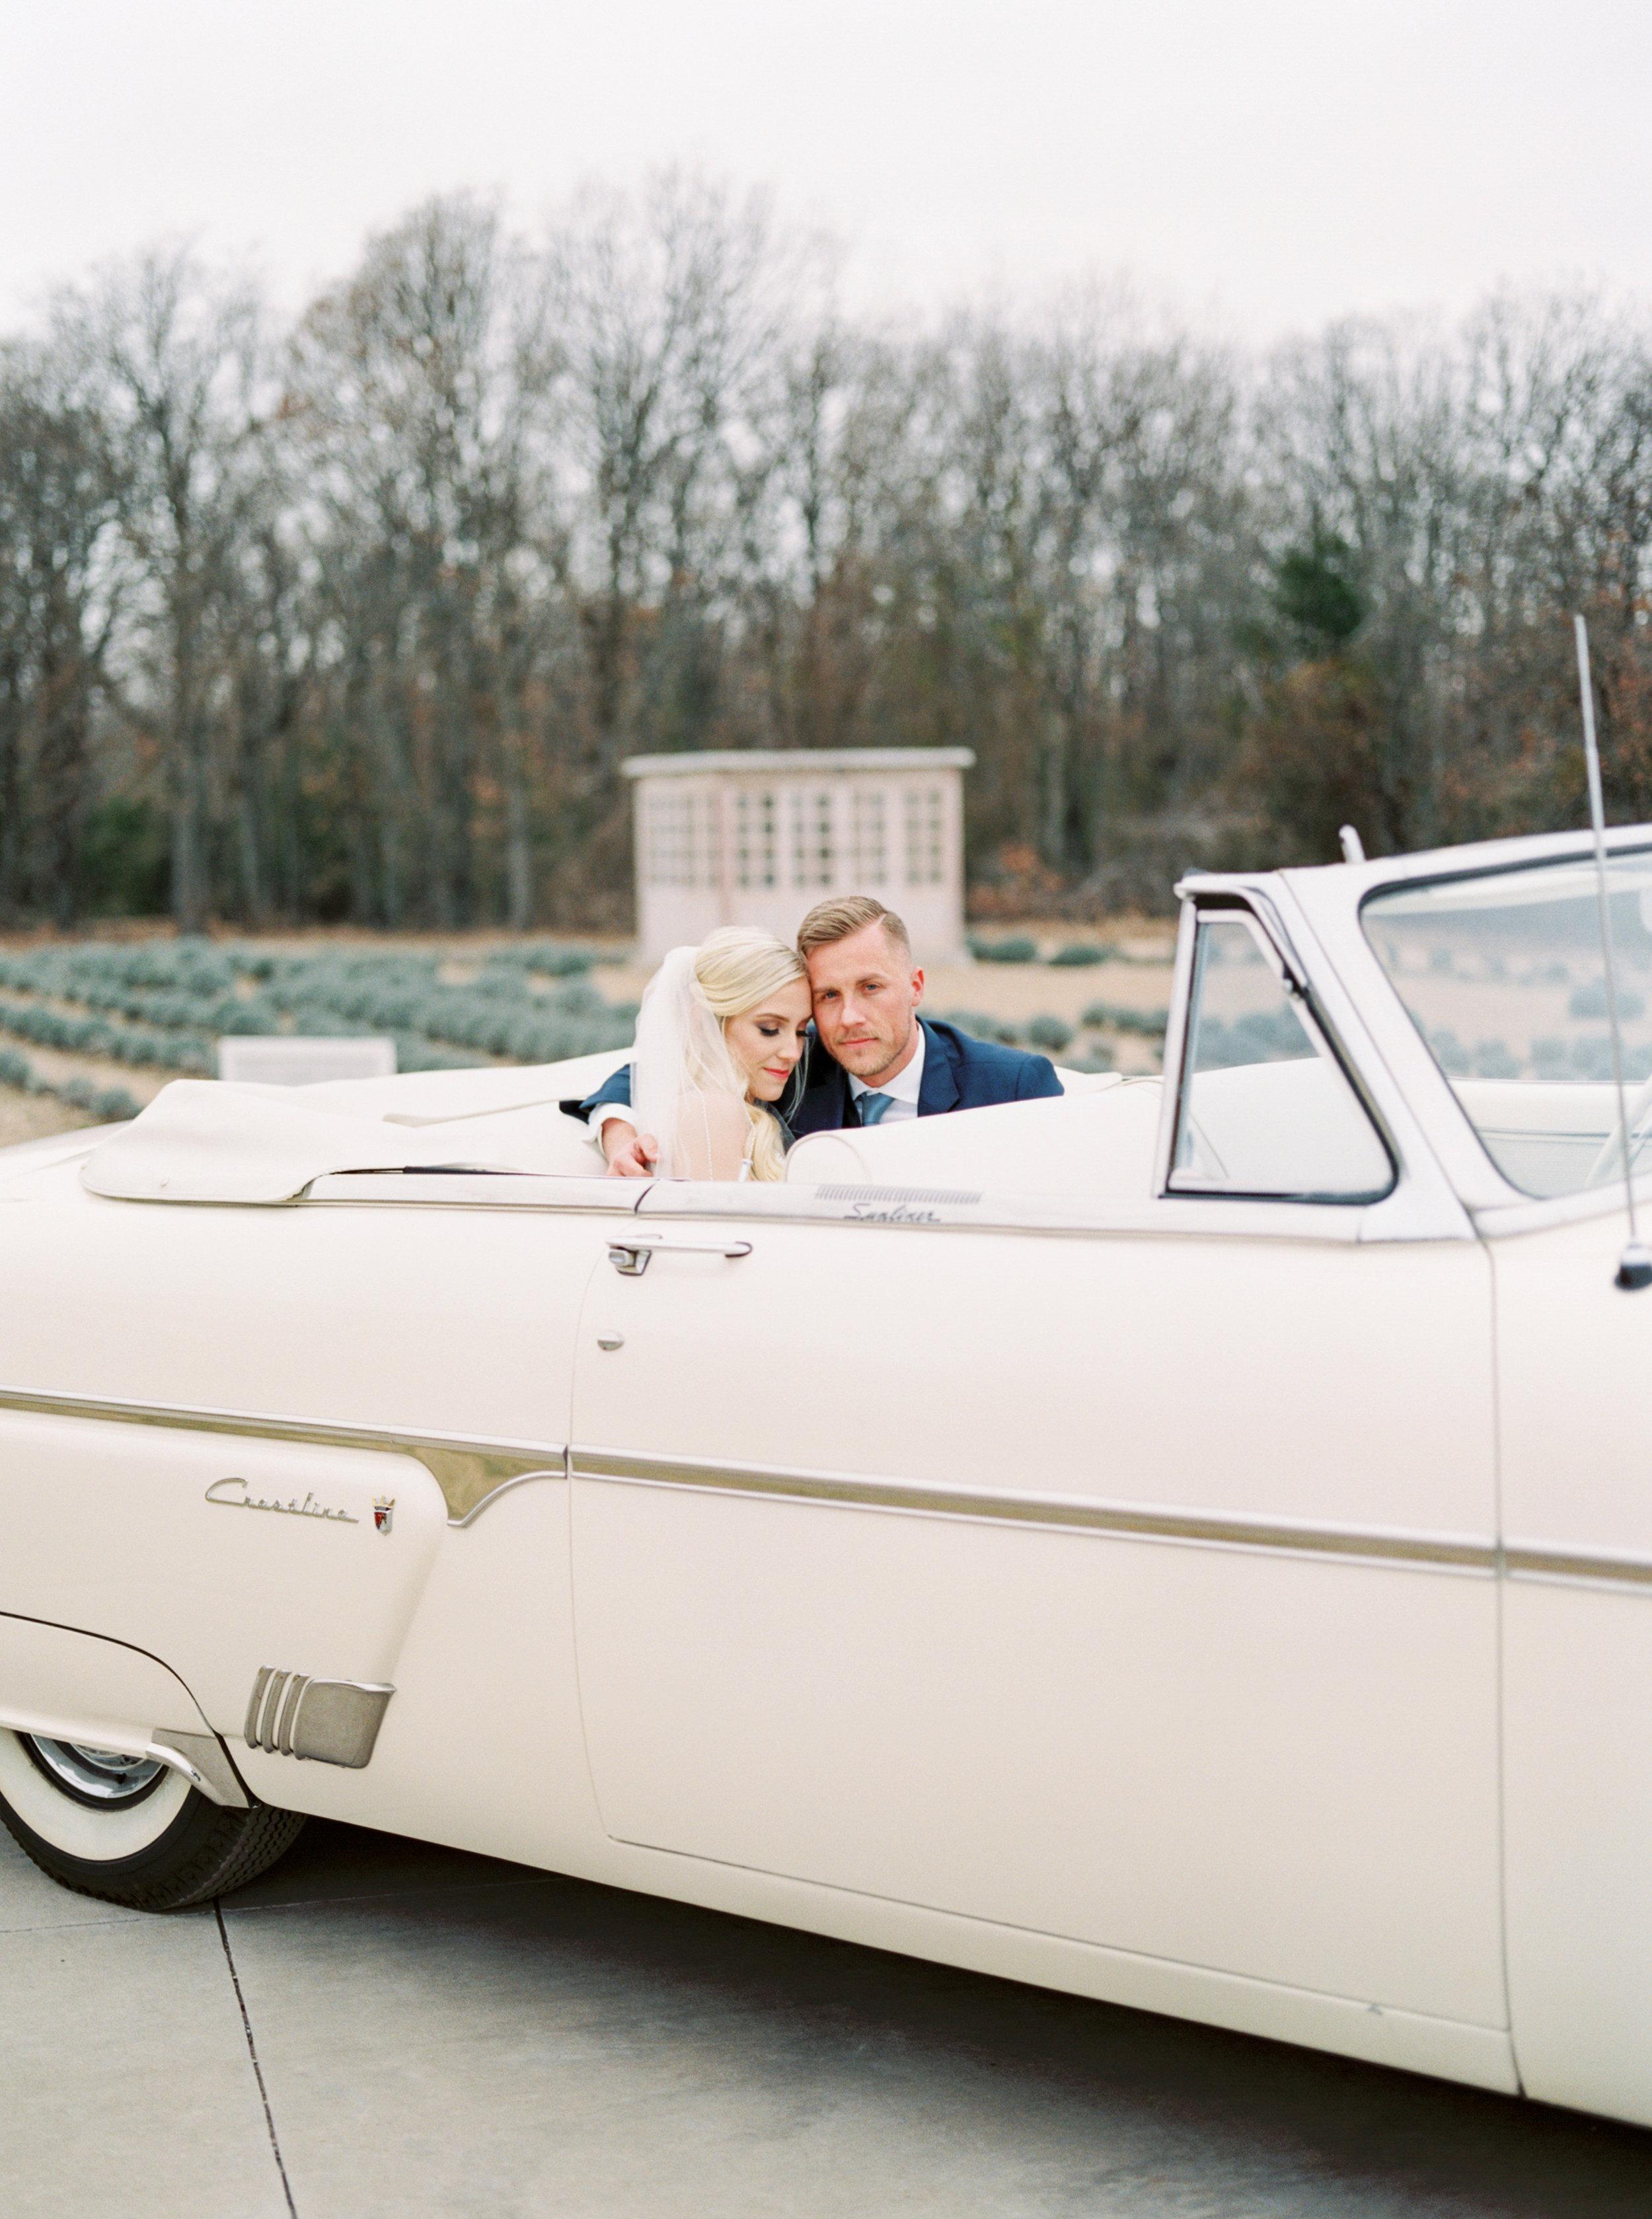 Chloe+Austin Wedding_659.JPG